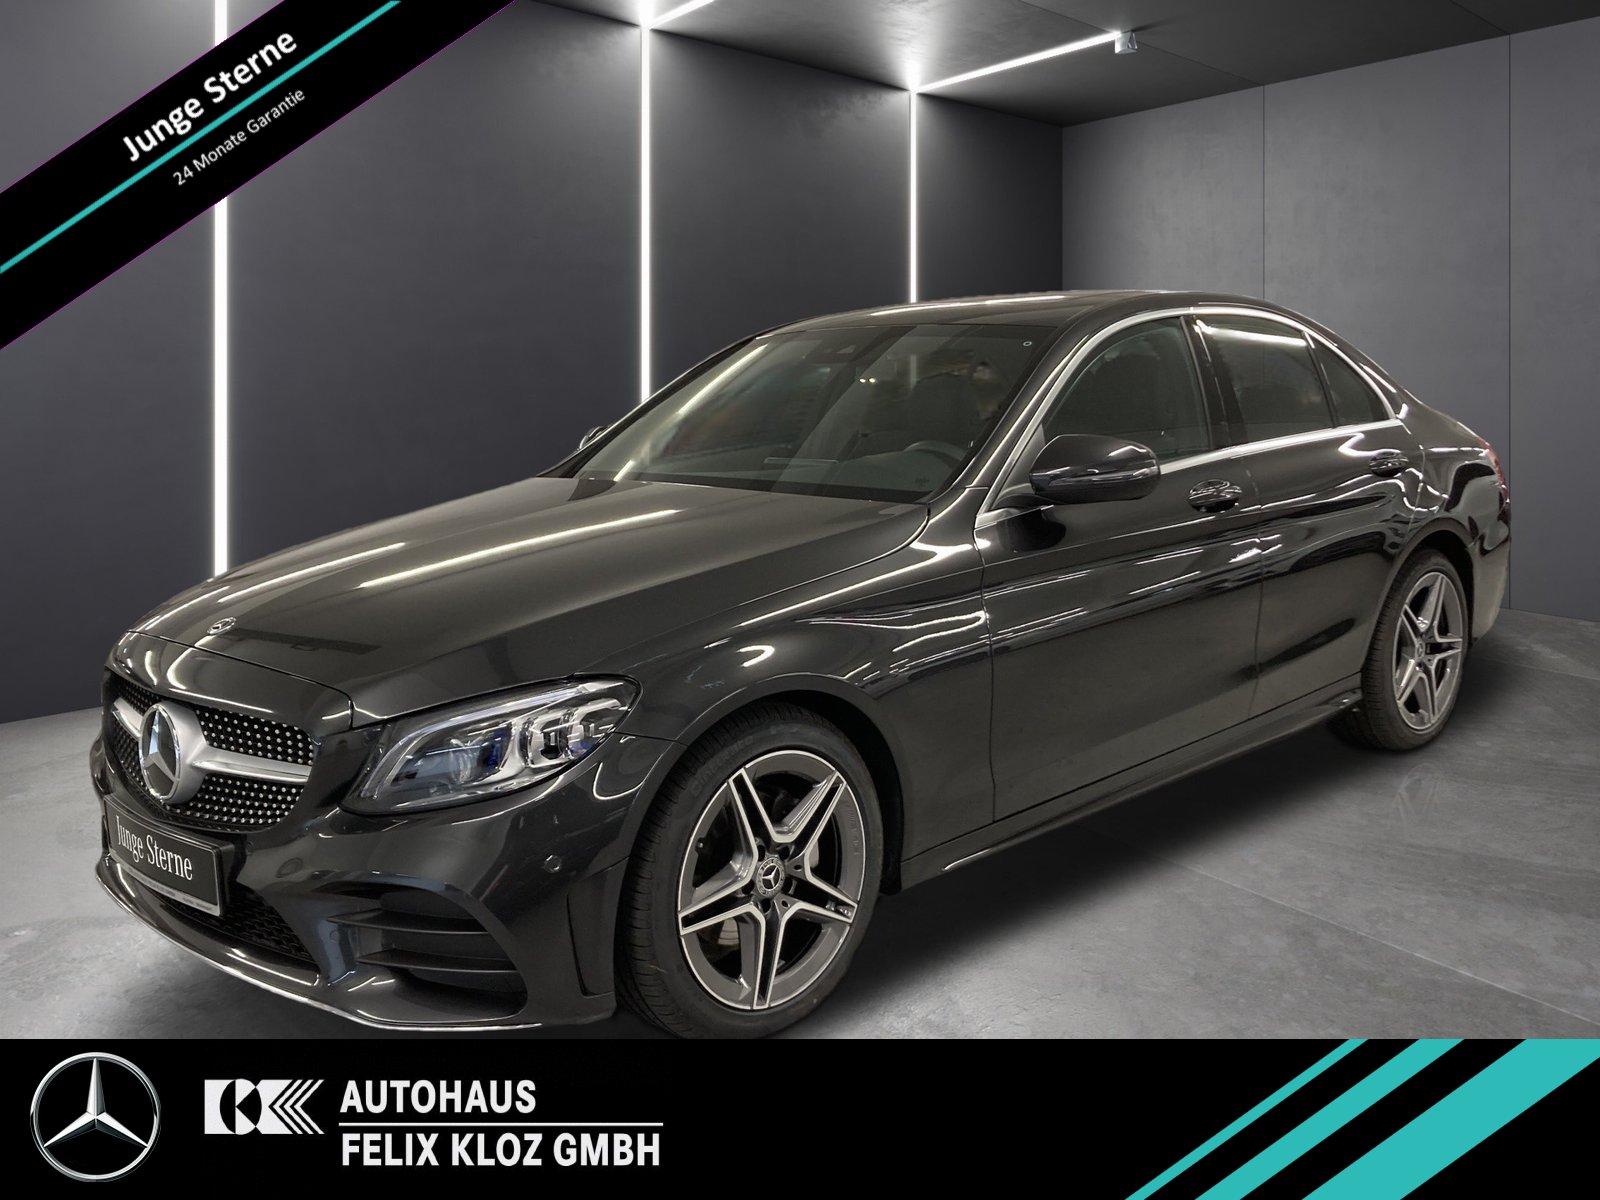 Mercedes-Benz C 200 AMG Line*High-End Infotainment*Assistenz-P, Jahr 2020, Benzin